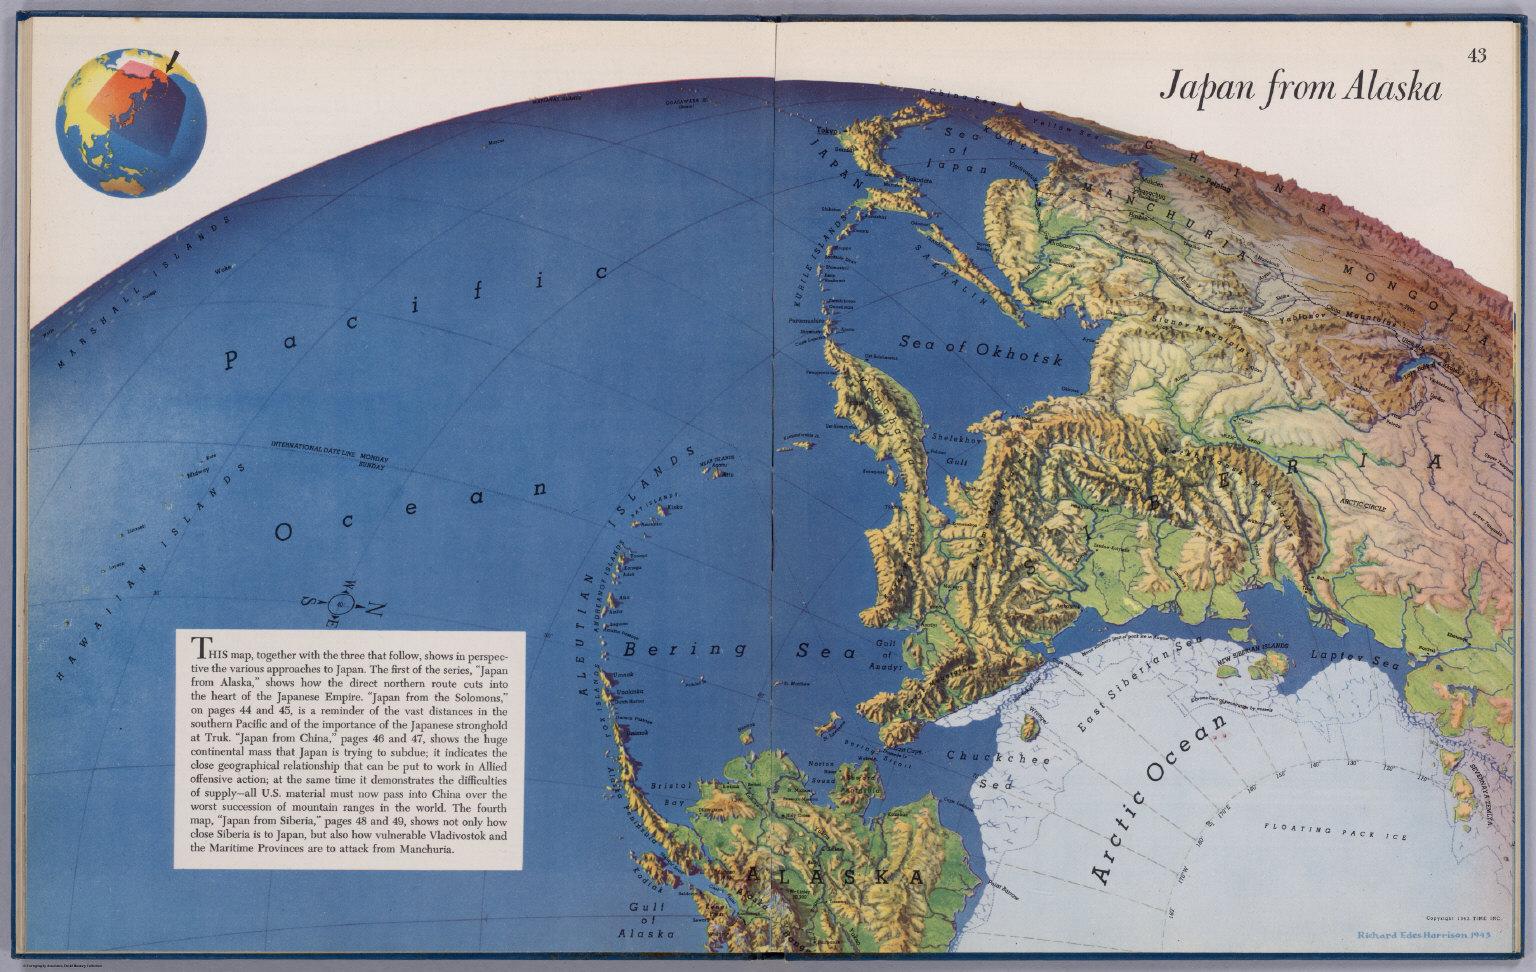 Japan to alaska david rumsey historical map collection japan to alaska gumiabroncs Choice Image